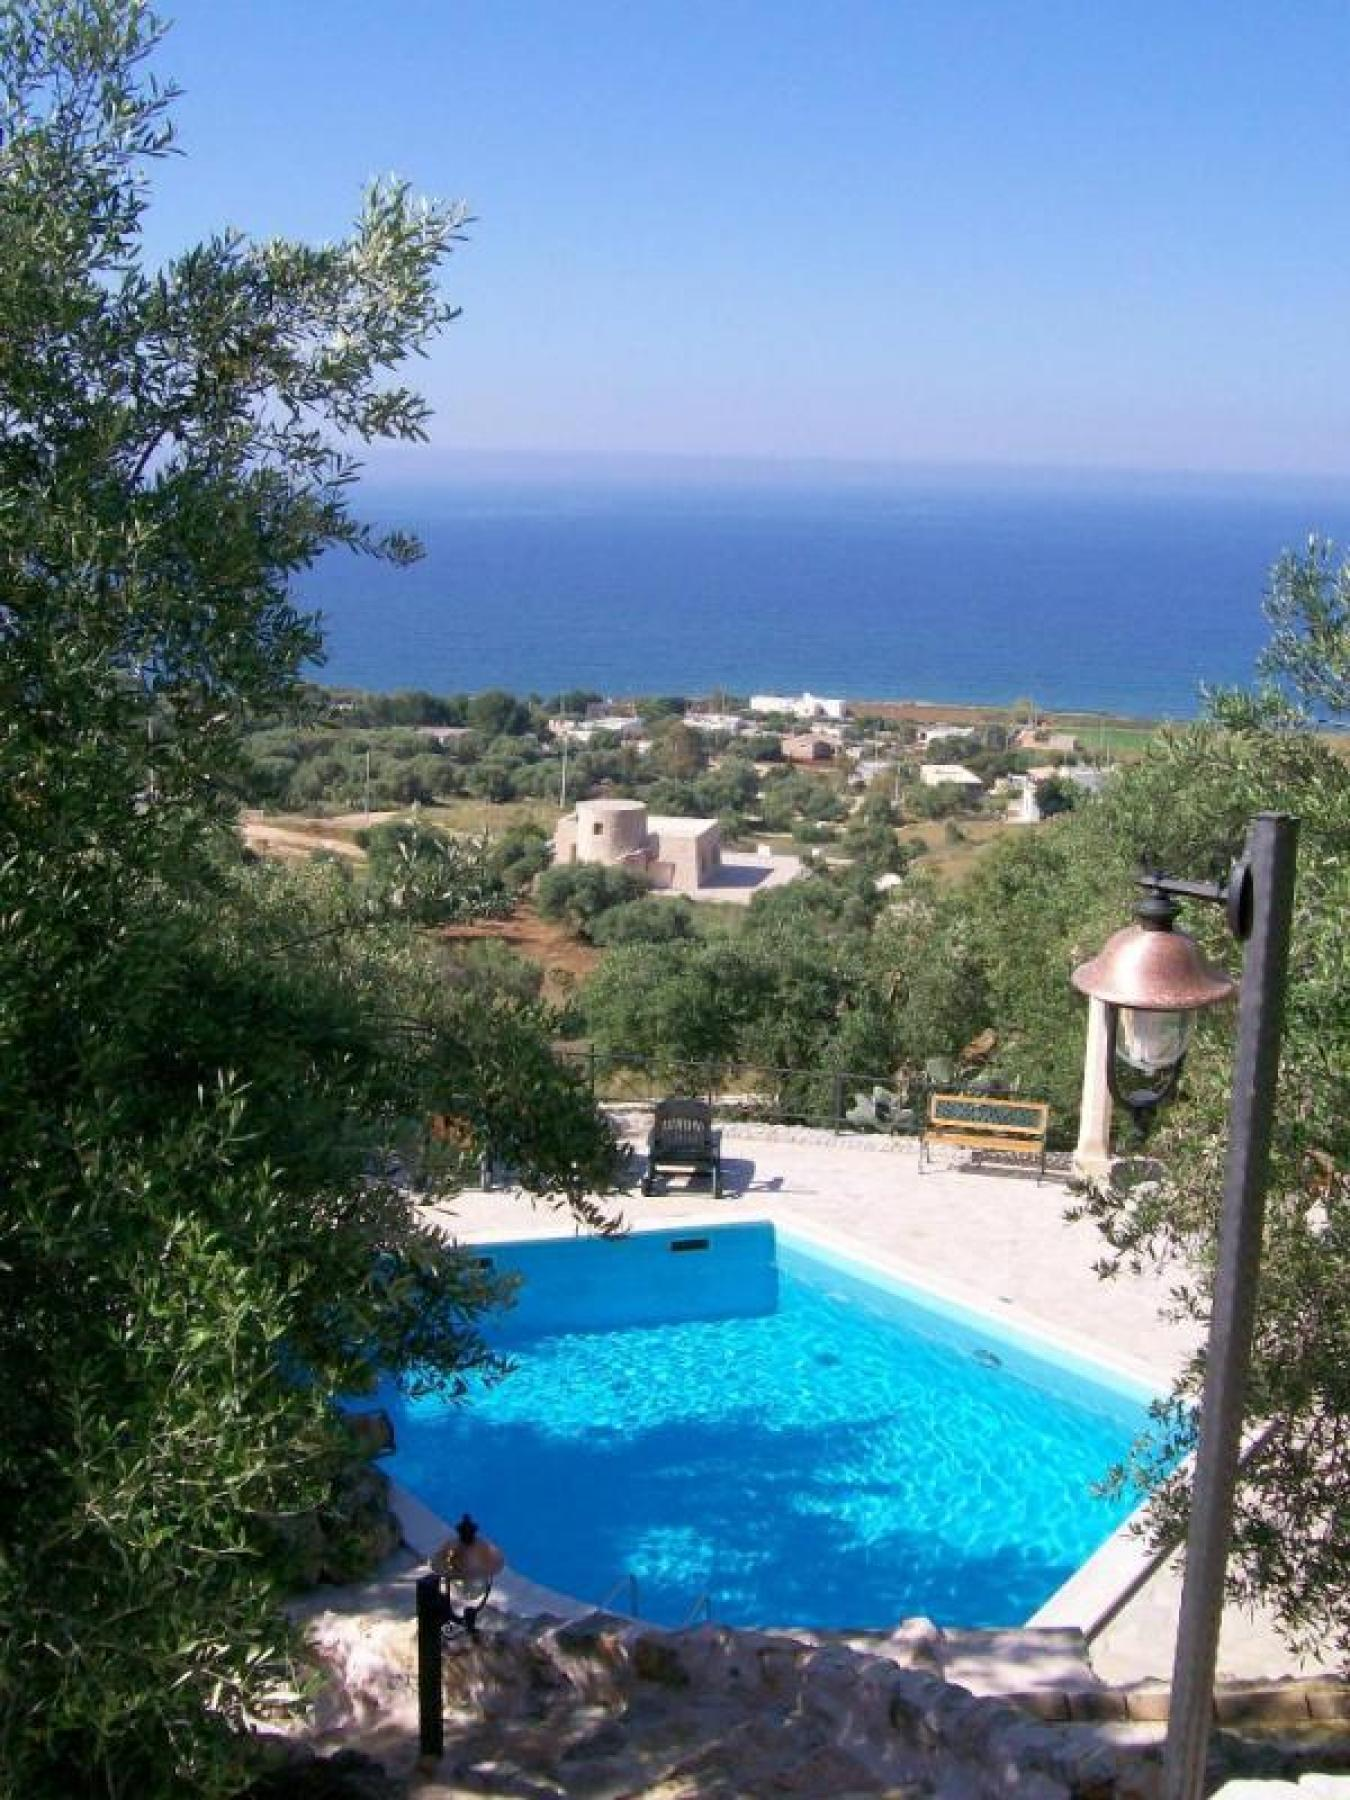 Villa nepole a torre vado villa con piscina n affitto per - Casa vacanza con piscina salento ...